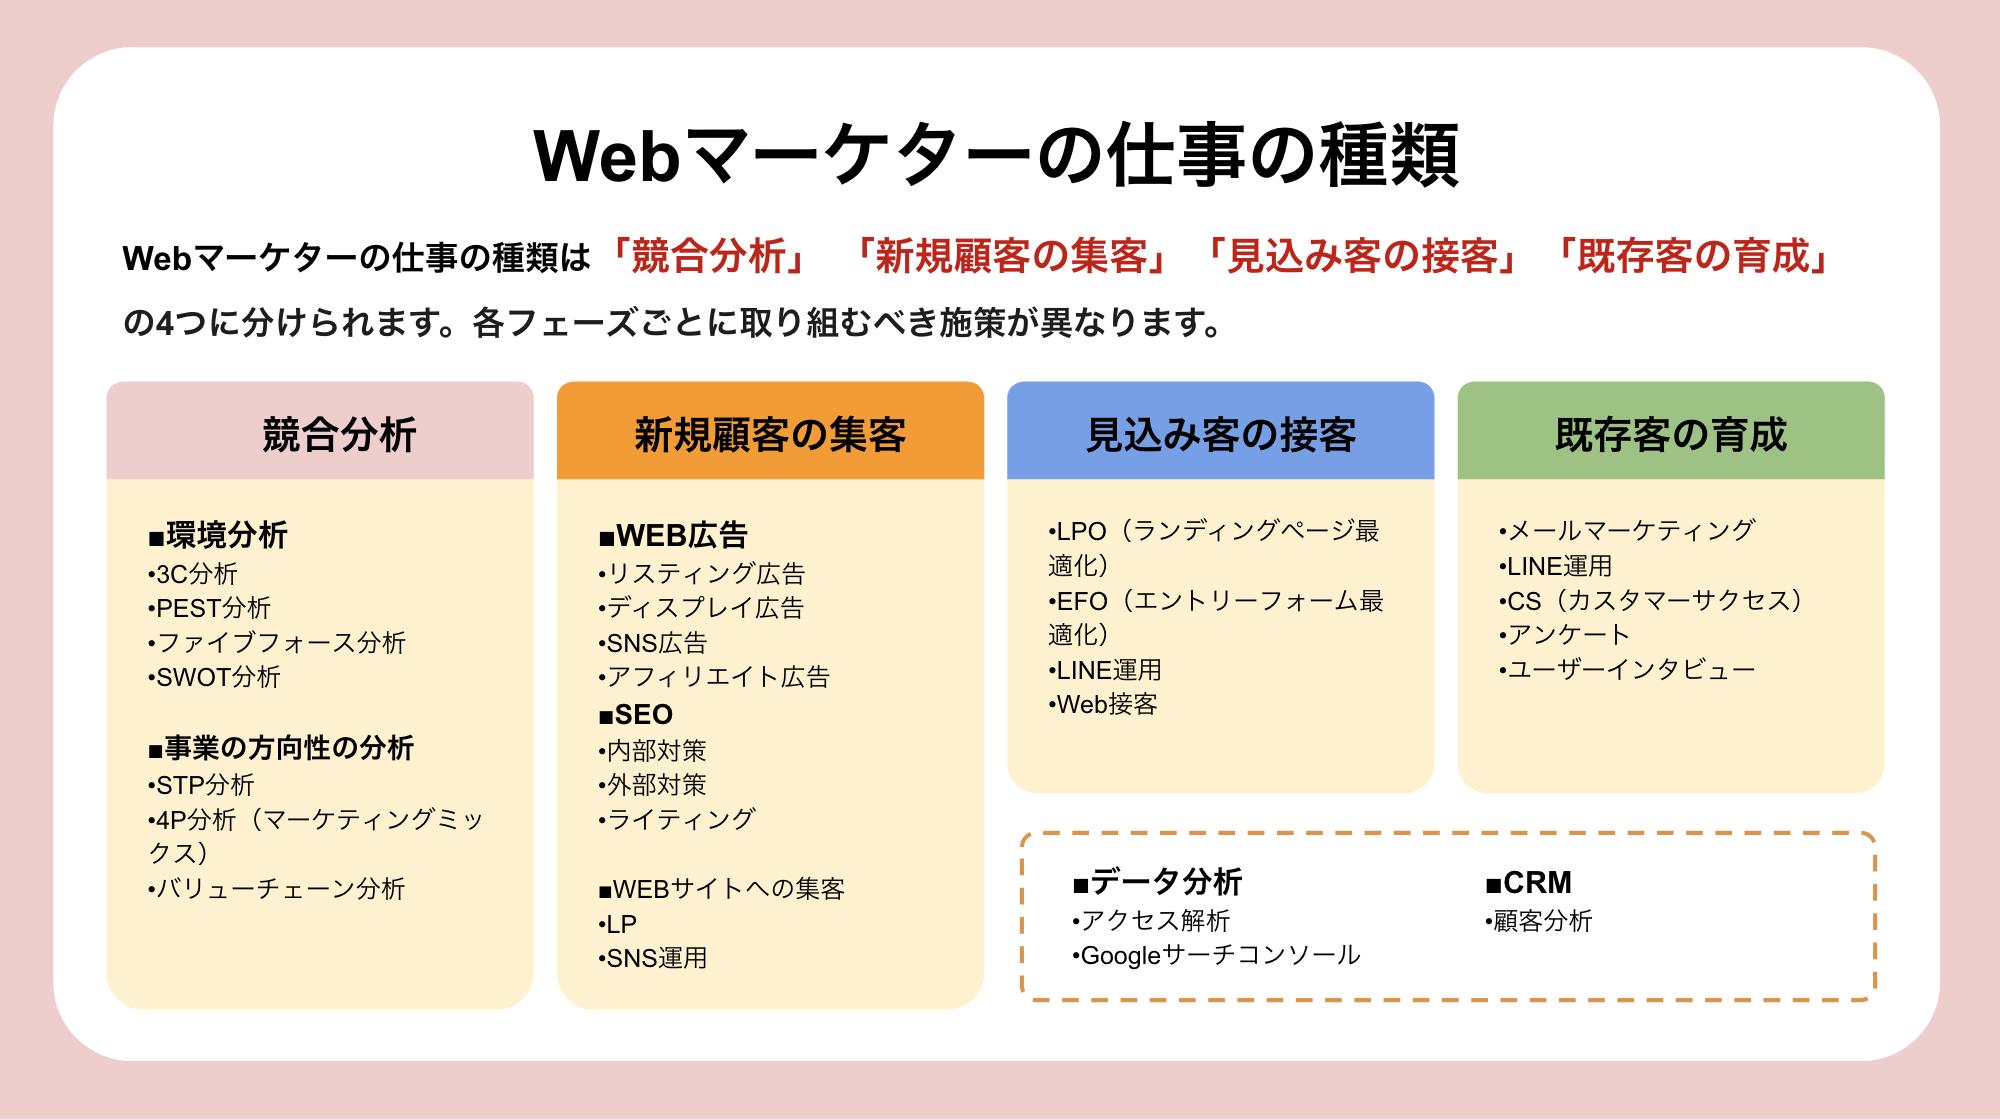 Webマーケターの仕事の種類.png